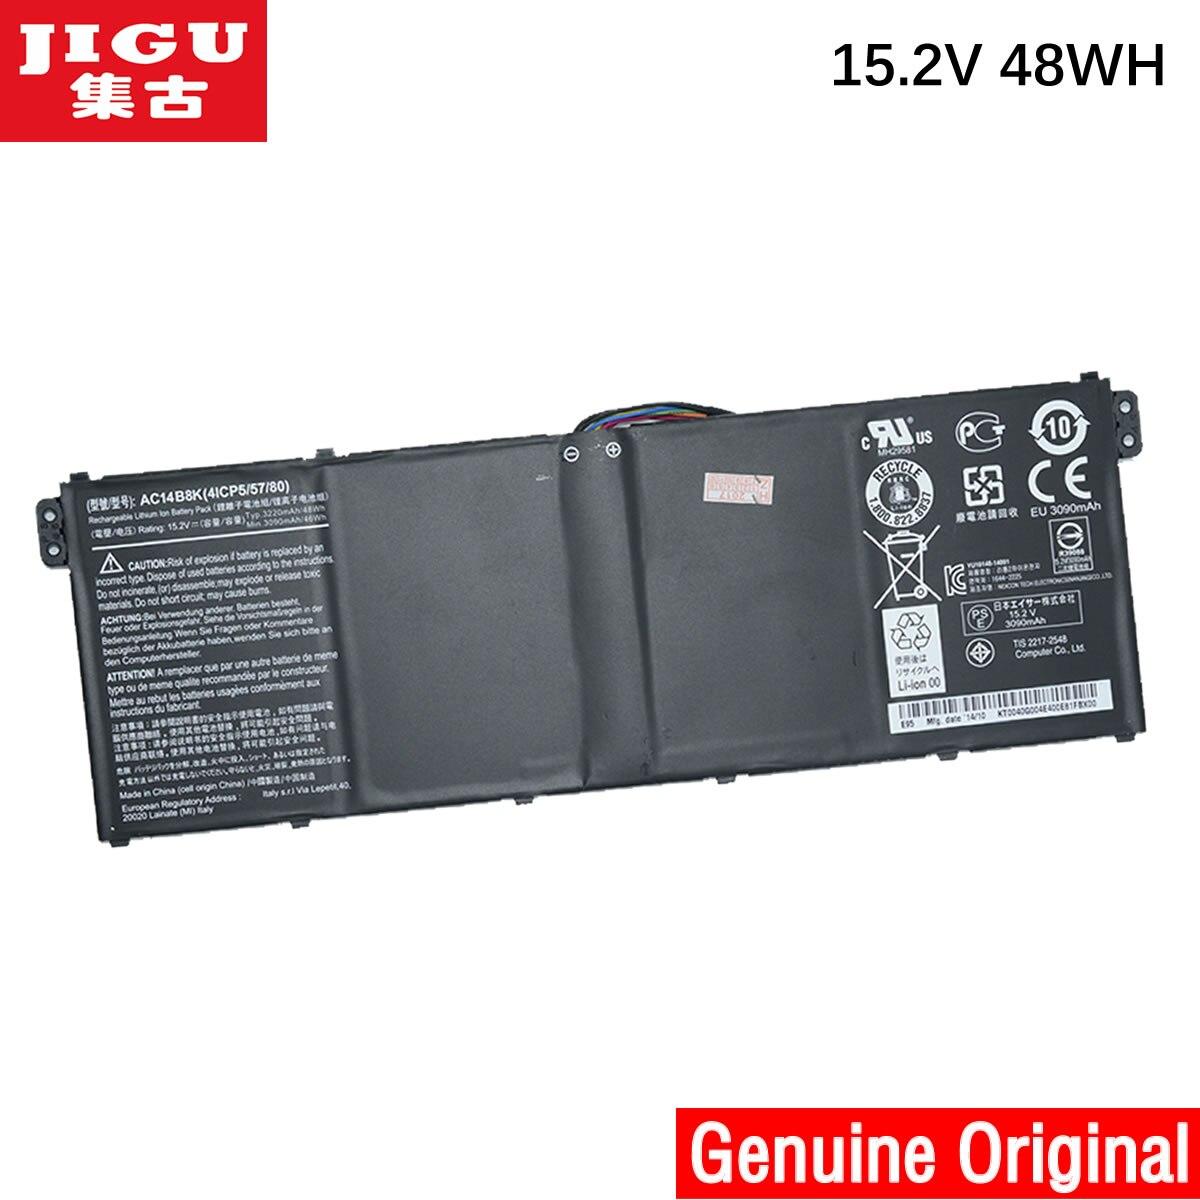 JIGU Dorigine batterie dordinateur portable AC14B8K POUR Acer Aspire E3-111 E3-112 CB3-111 CB5-311 ES1-511 ES1-512 E5-771G V3-111 V3-371 ES1-711JIGU Dorigine batterie dordinateur portable AC14B8K POUR Acer Aspire E3-111 E3-112 CB3-111 CB5-311 ES1-511 ES1-512 E5-771G V3-111 V3-371 ES1-711